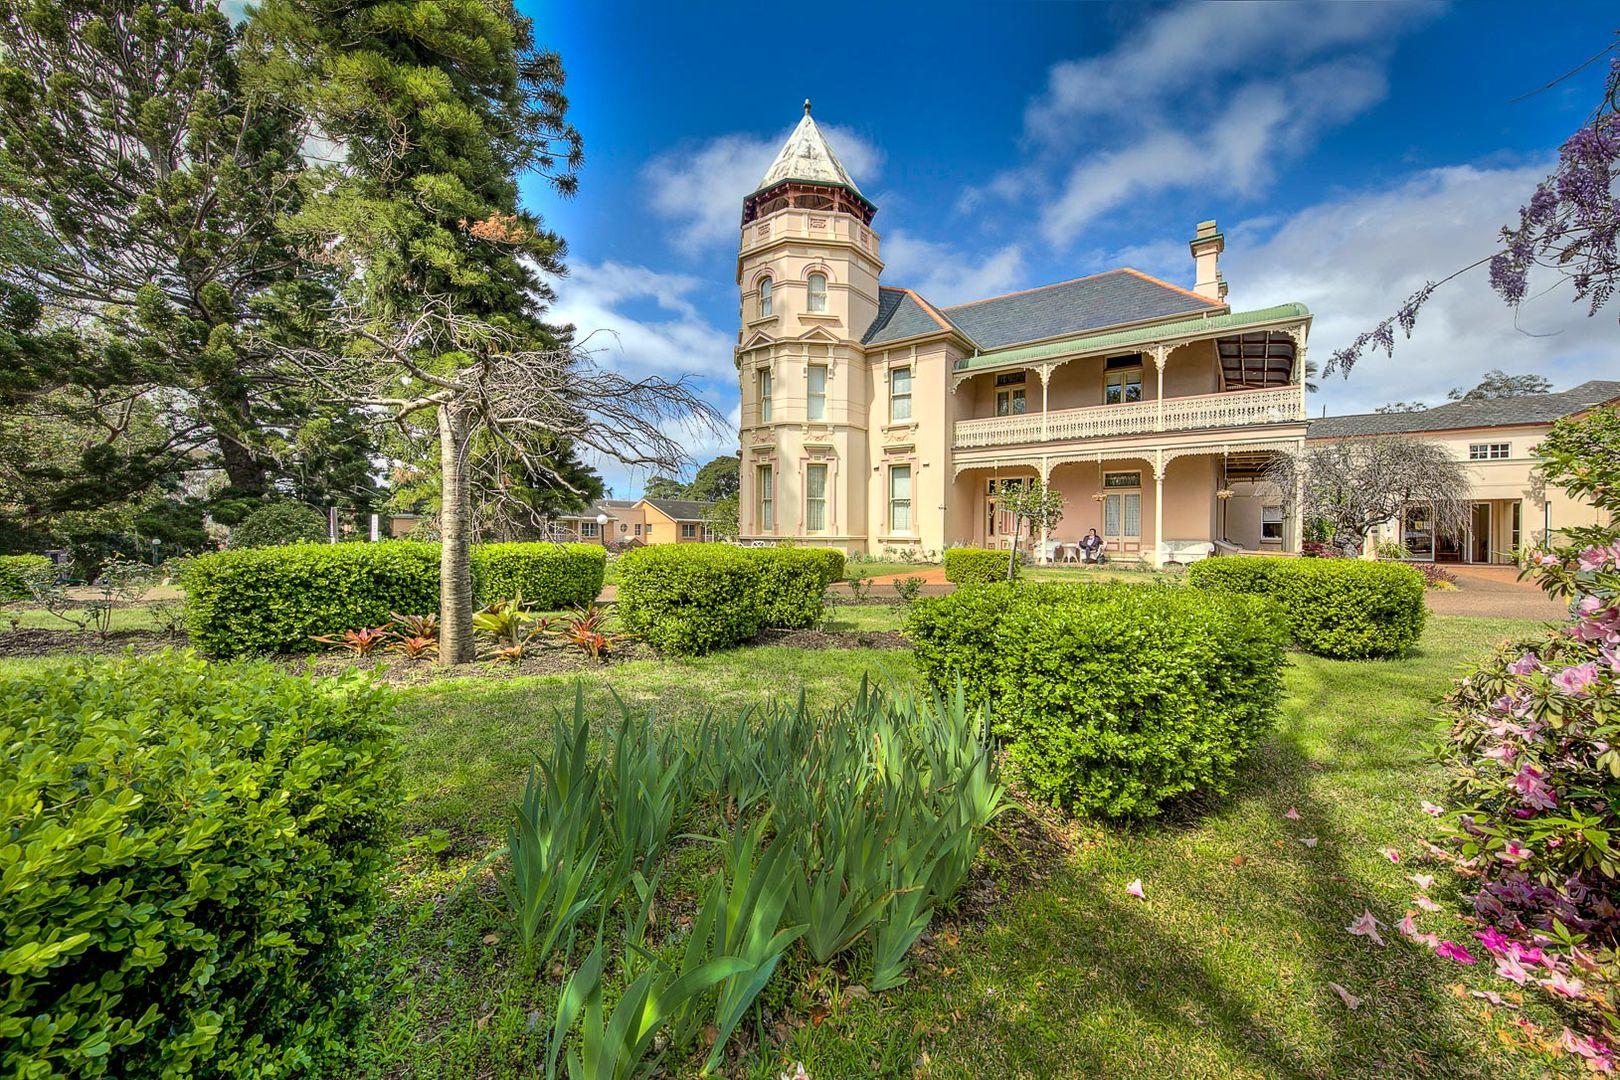 57/244-264 Mowbray Road, Chatswood NSW 2067, Image 2